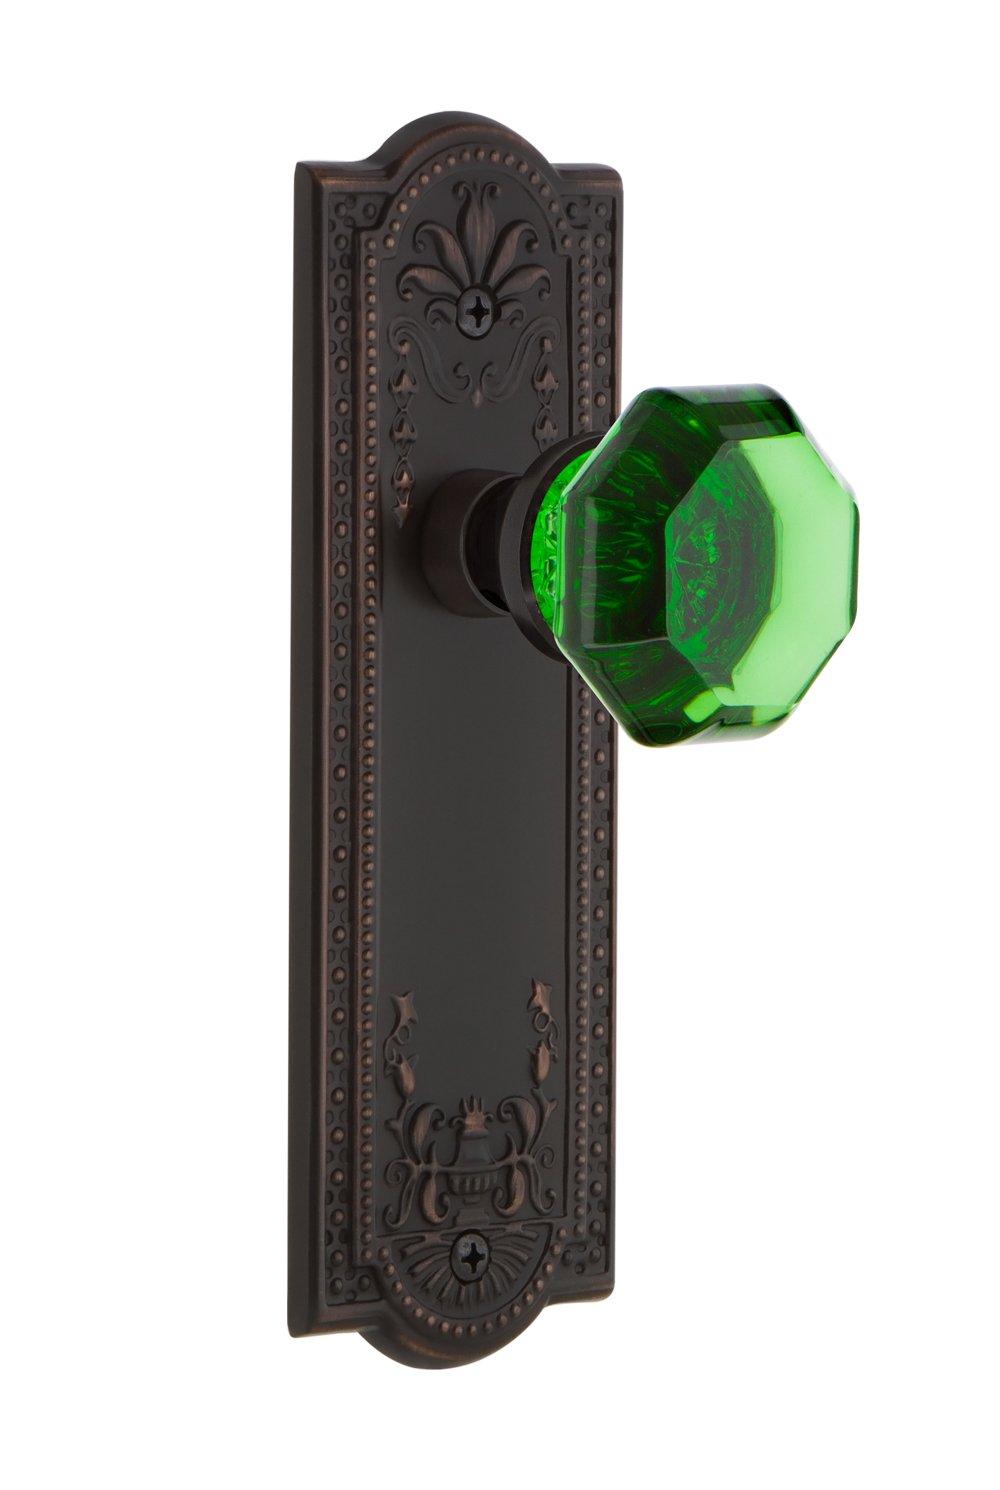 2.375 Nostalgic Warehouse 720728 Meadows Plate Passage Waldorf Emerald Door Knob in Polished Brass